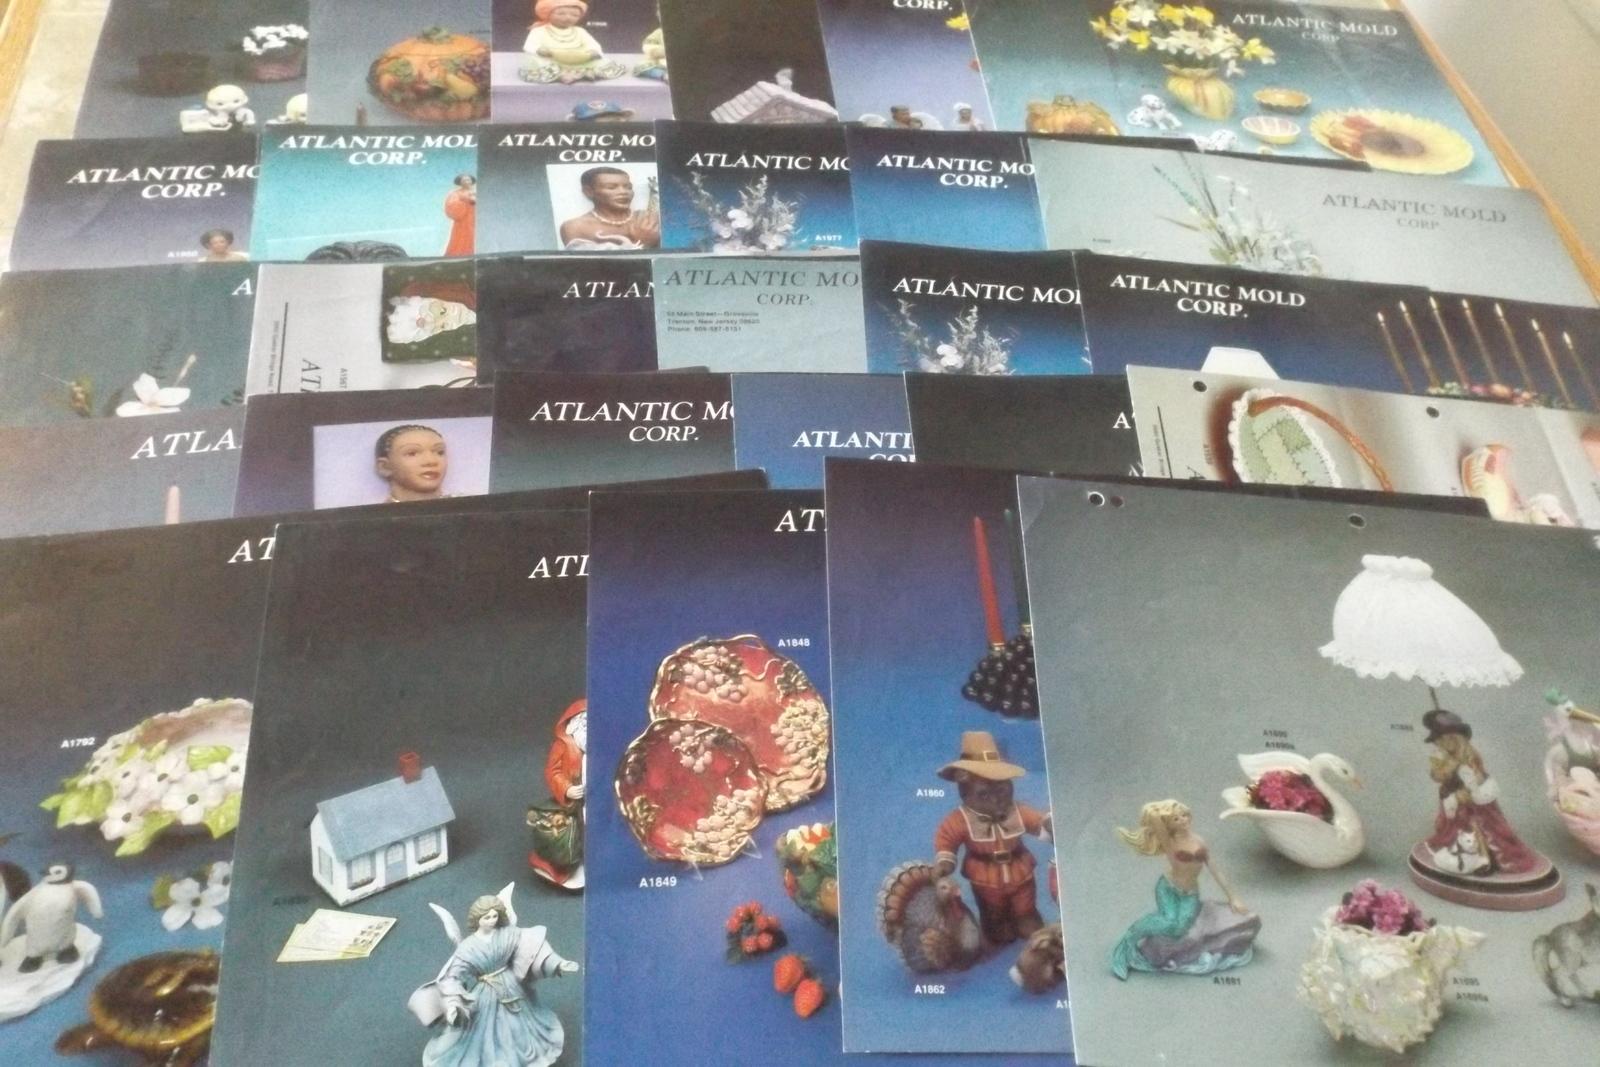 24 Atlantic Mold Corp. Ceramic Technique Sheets 1988-1999 and 5 Bonus Sheets